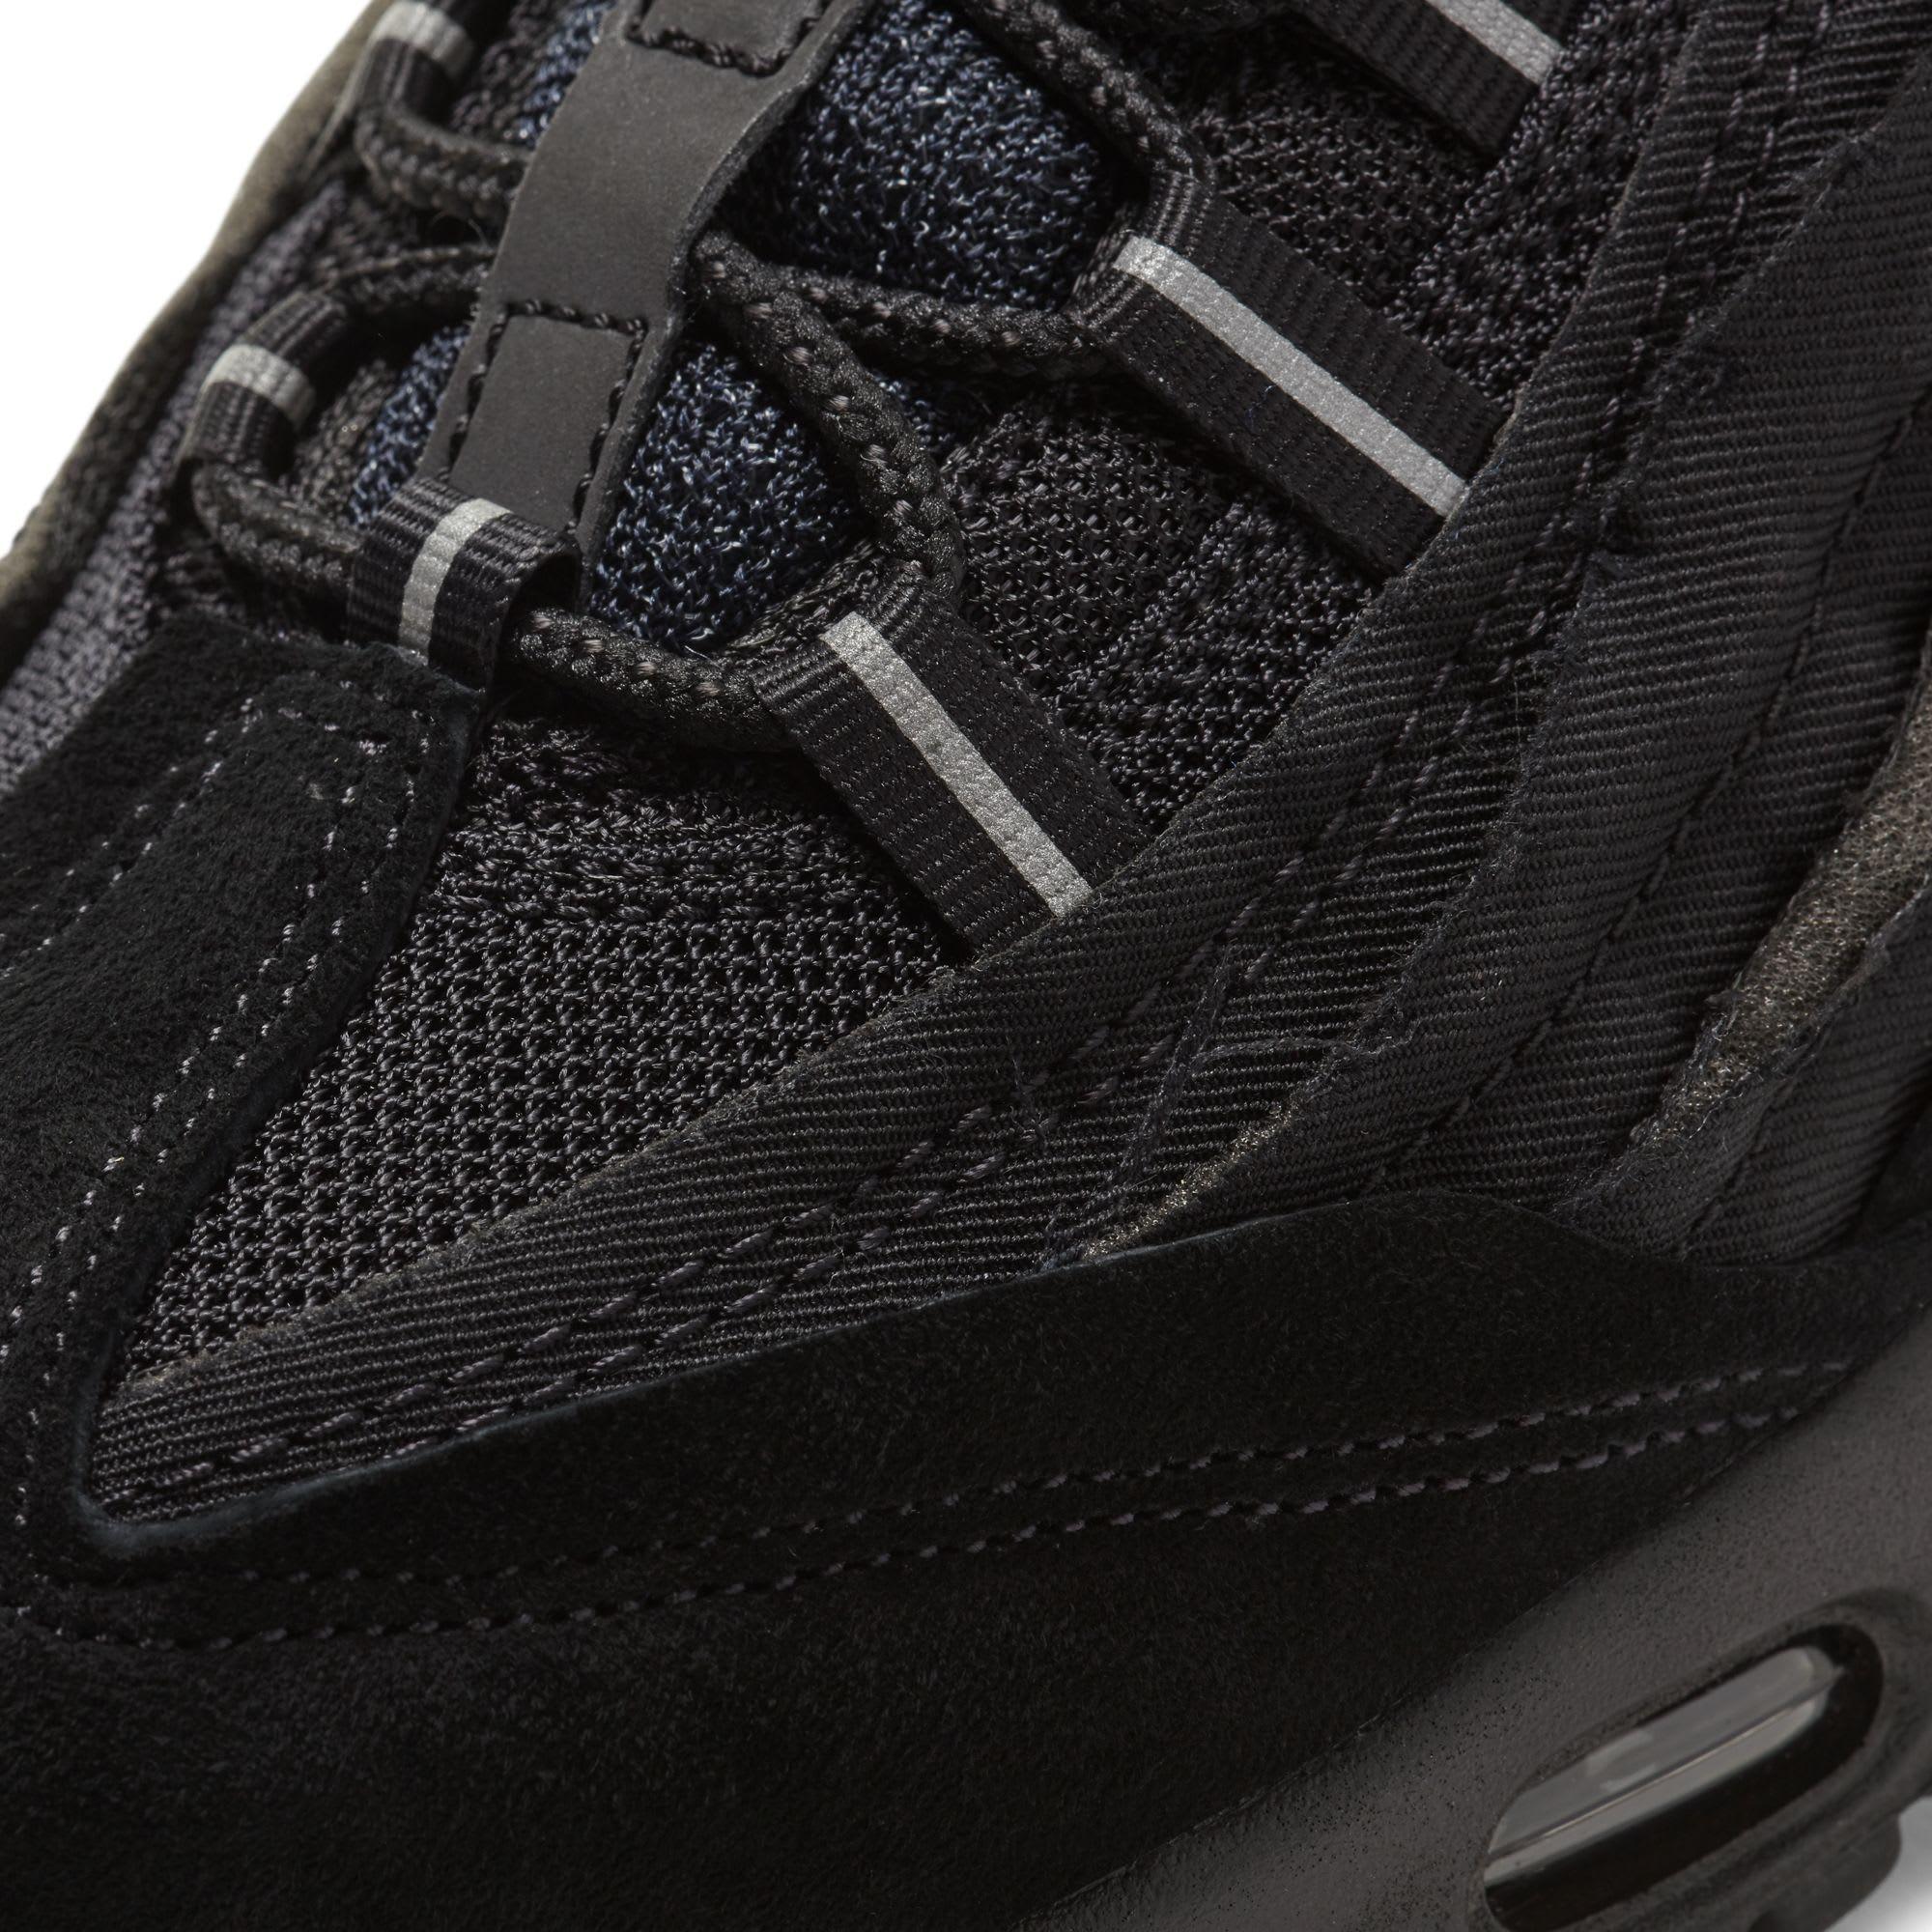 Comme des Garçons x Nike Air Max 95 'Triple Black' (Detail)